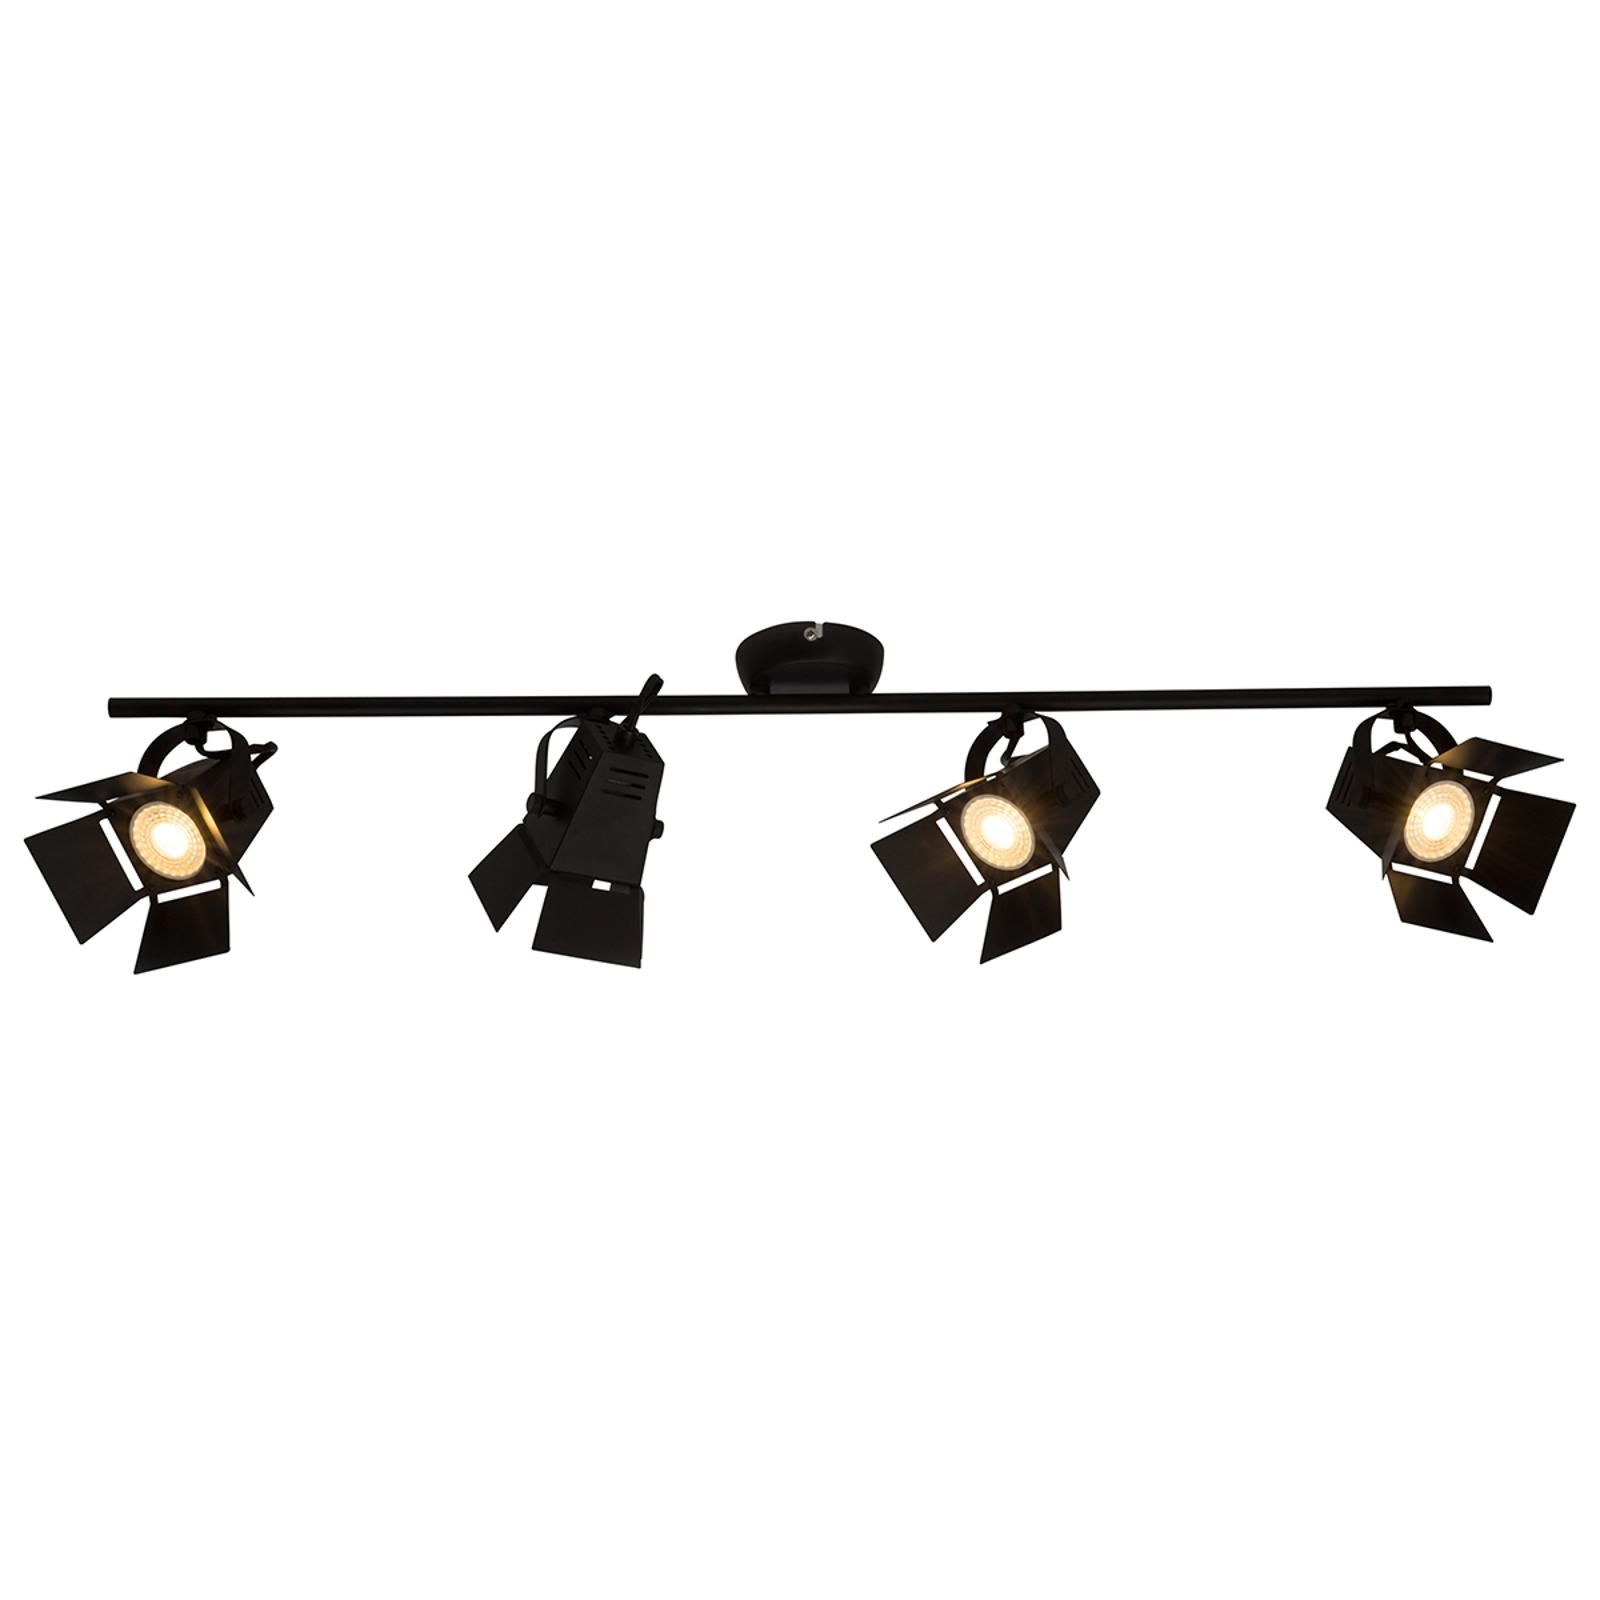 Movie - modern LED-spot-taklampa, svart